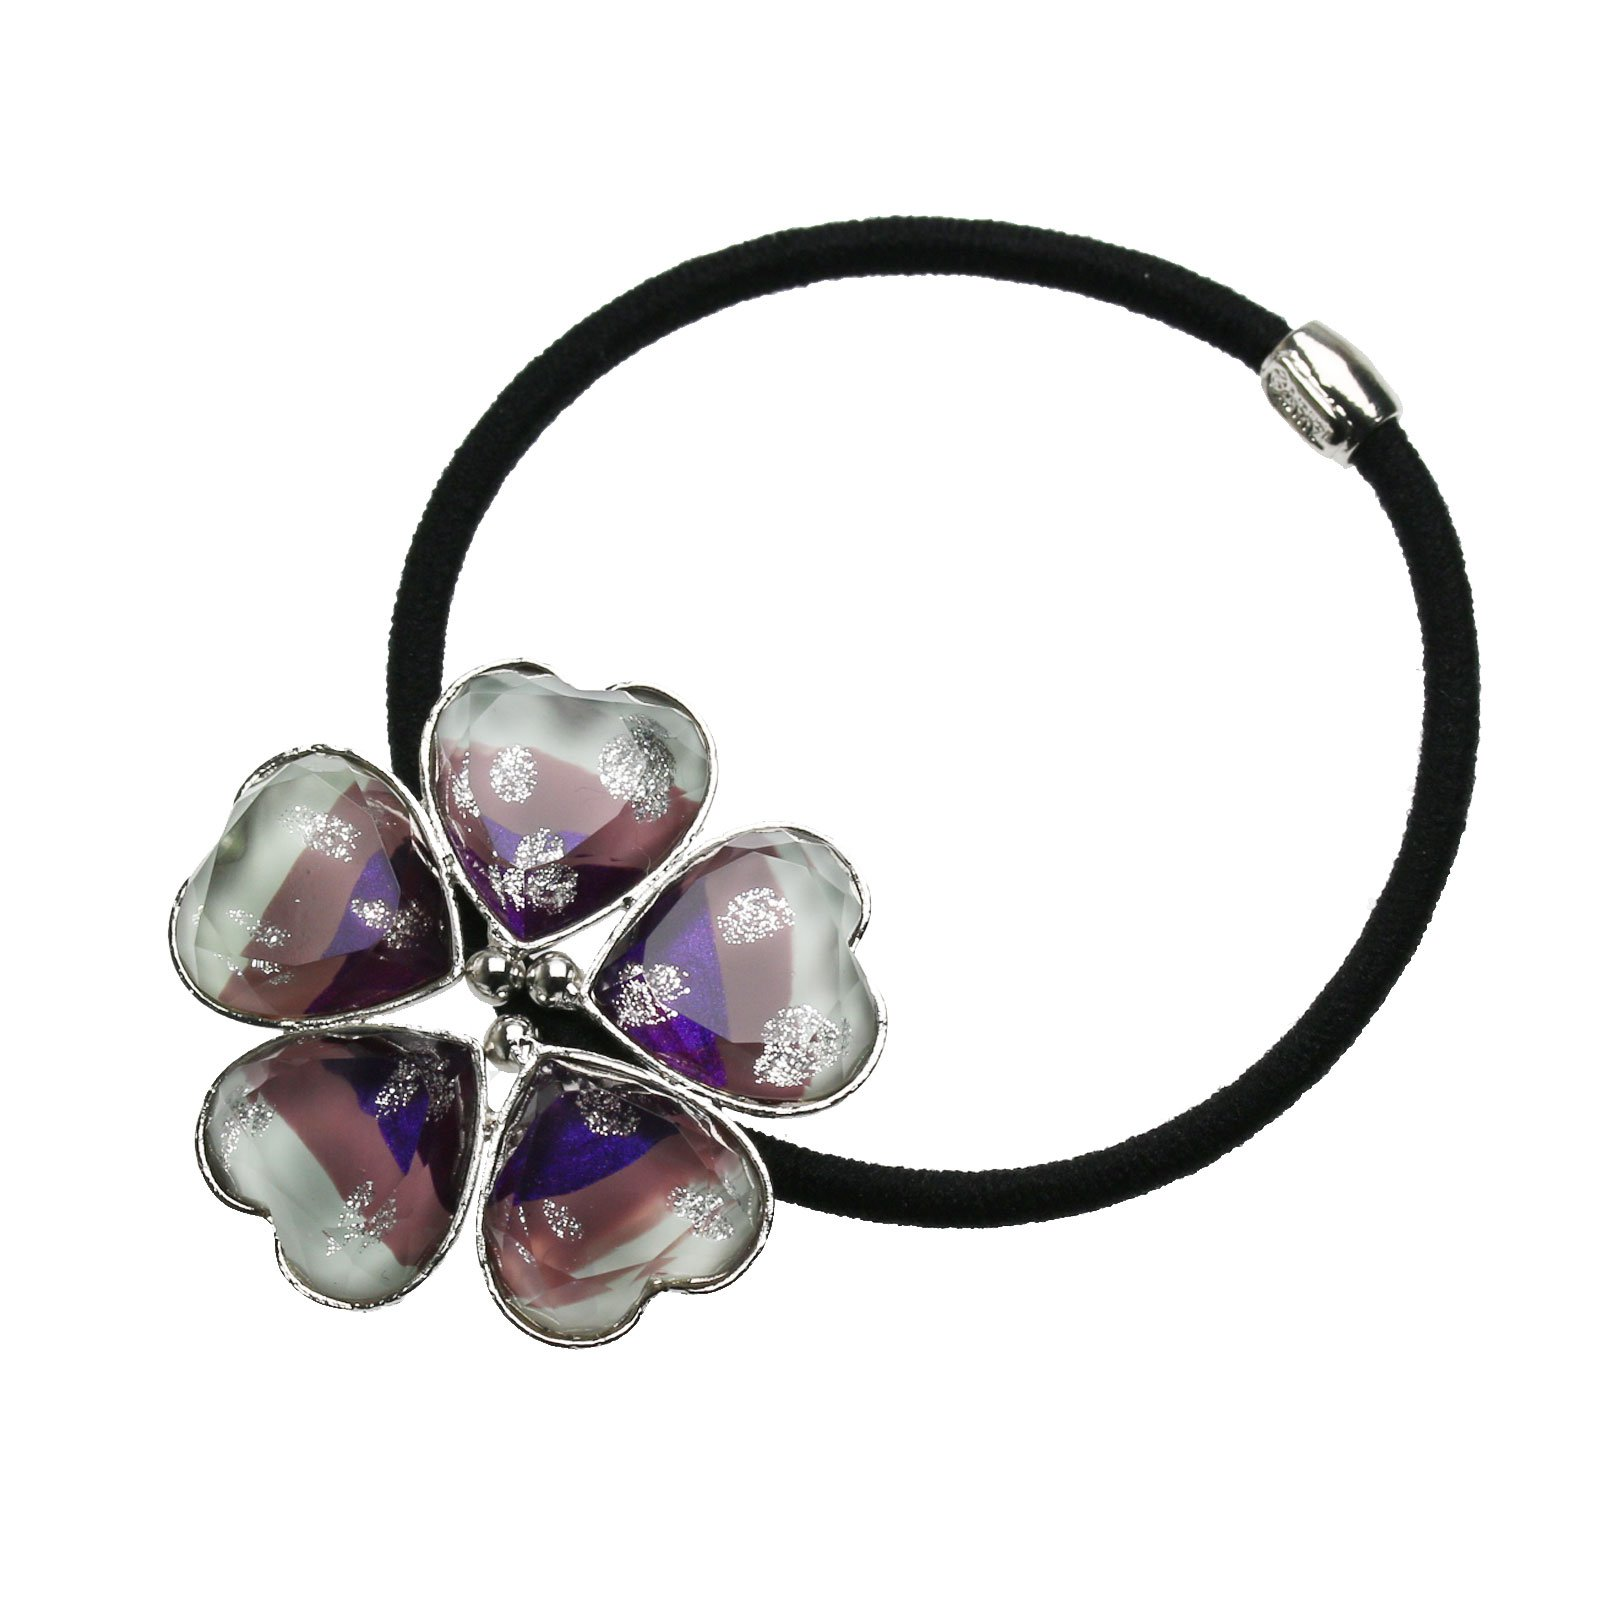 Tamarusan Ponytail Holder Purple Gradient Rainbow Flower Hair Rubber Heart Silver Lame